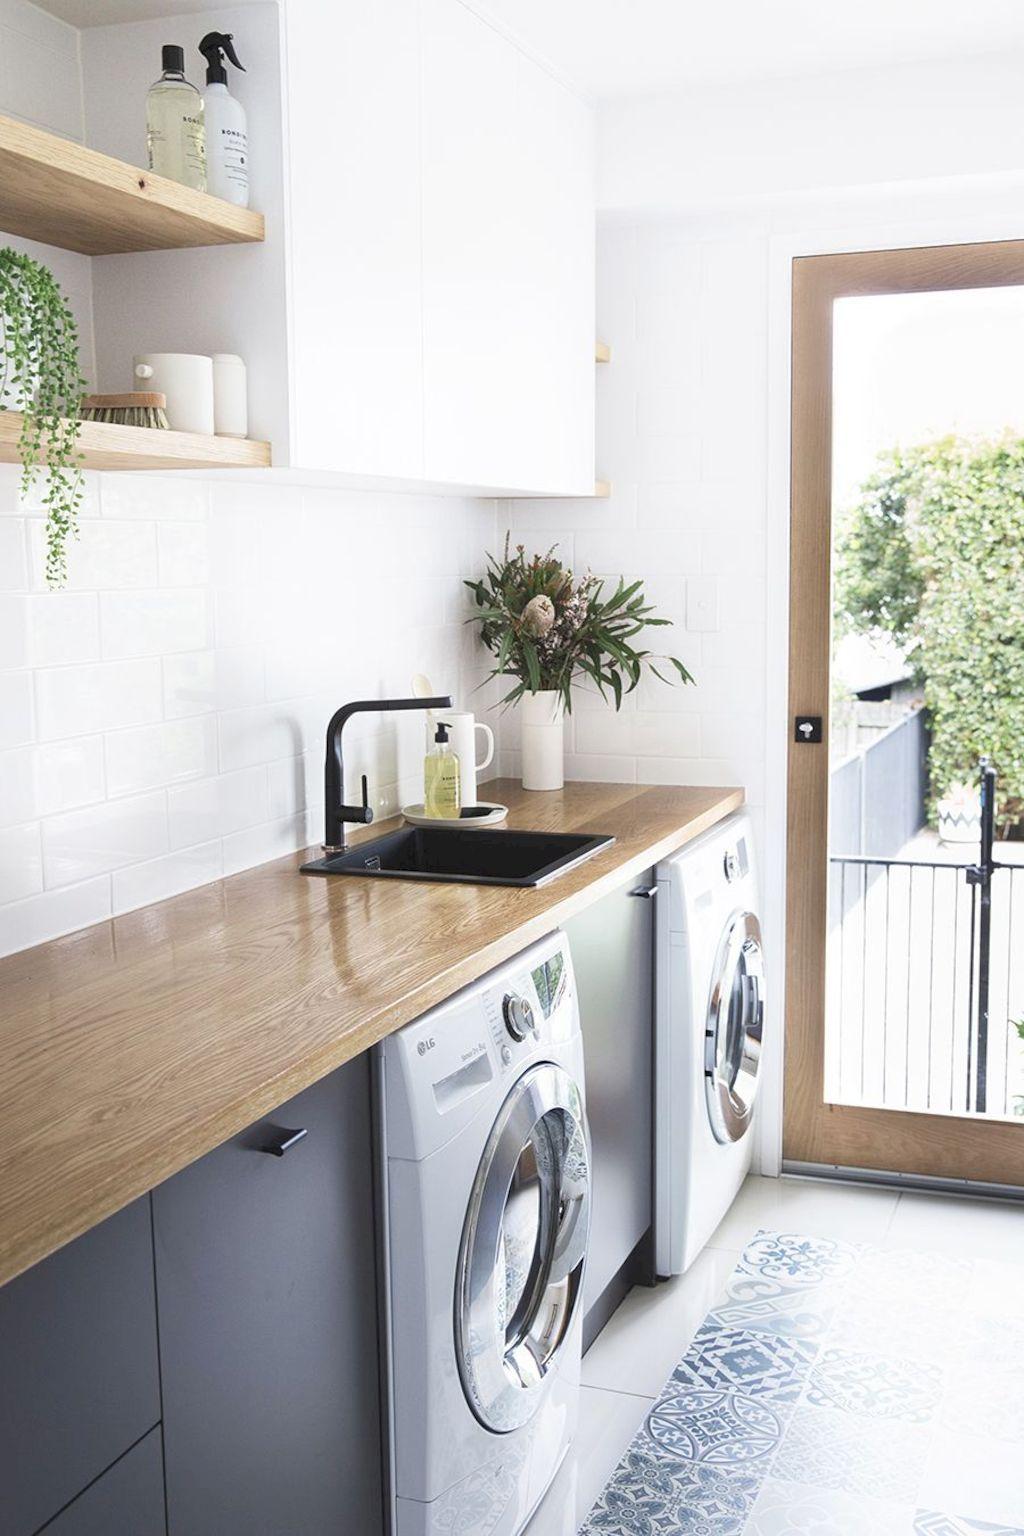 28 Modern Laundry Rooms Adopting Scandinavian Ideas In 2020 With Images Laundry Design Modern Laundry Rooms Laundry Room Design